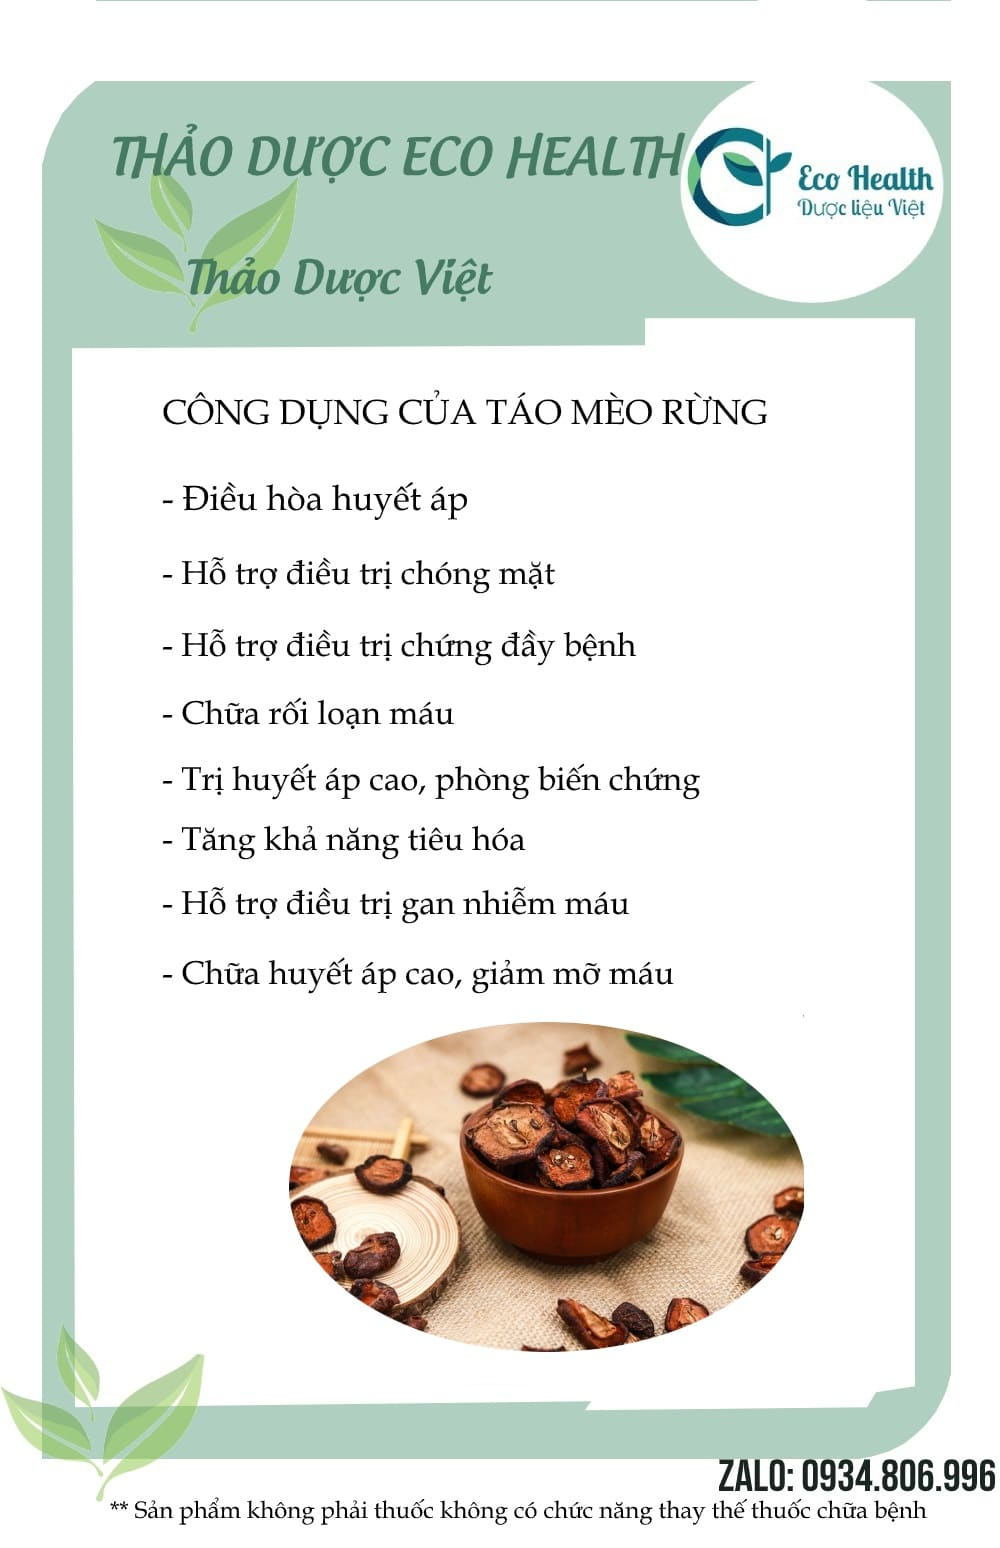 cong-dung-cua-tao-meo-rung